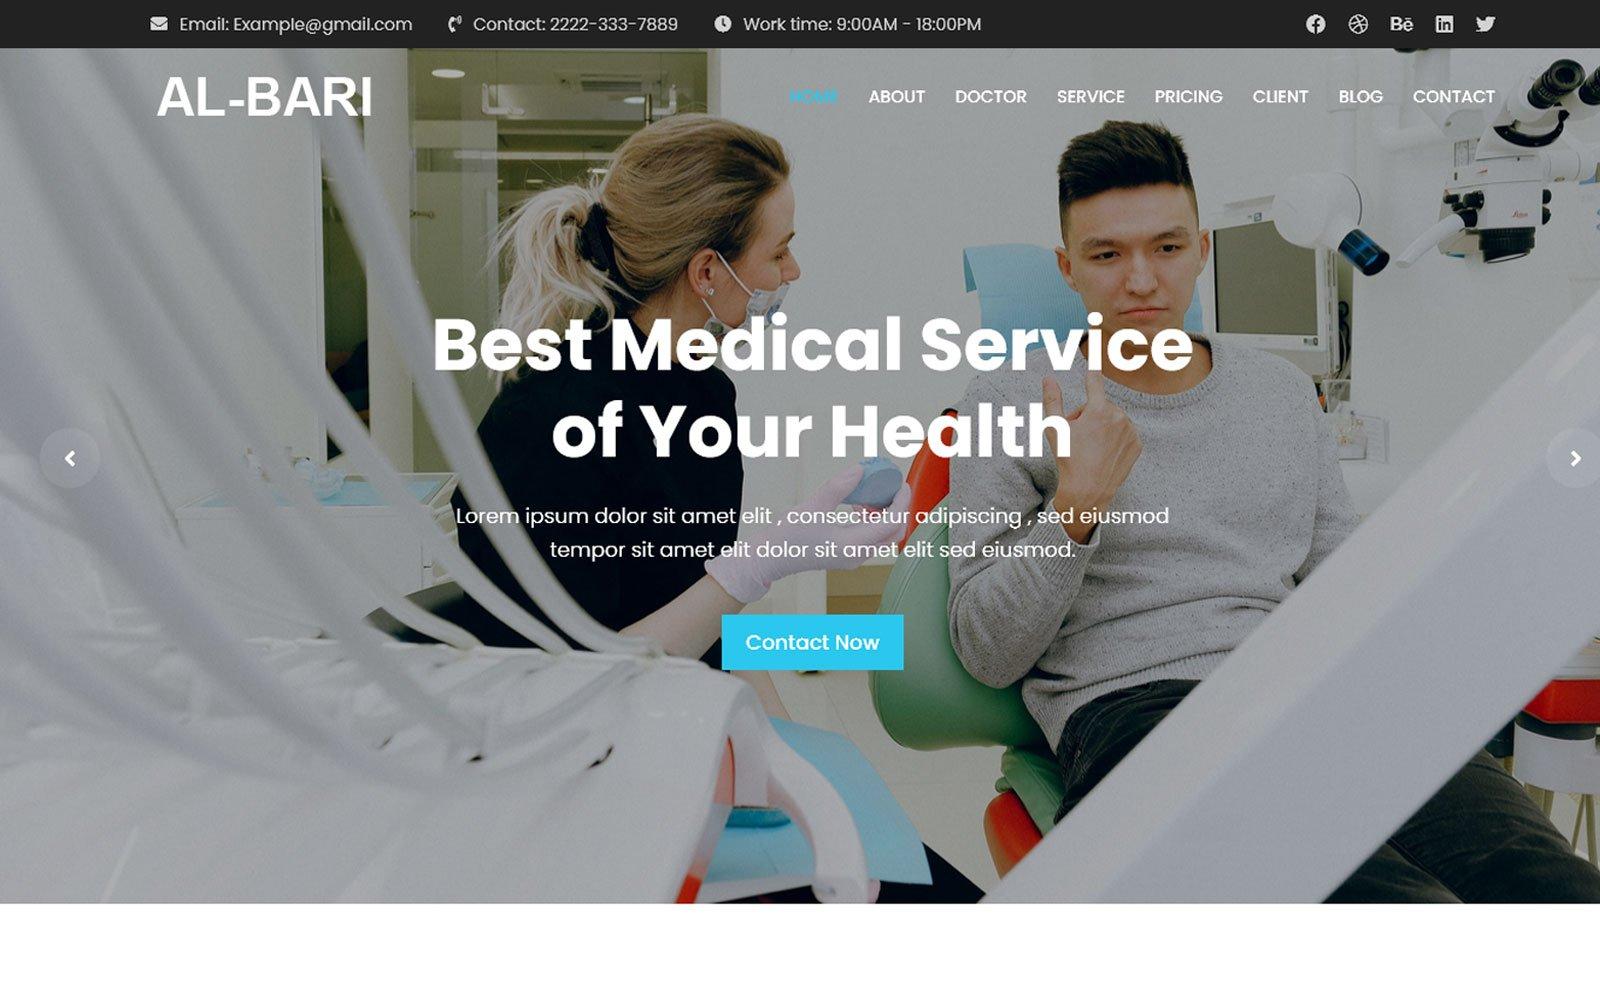 Al-Bari - Medical Service Landing Page template